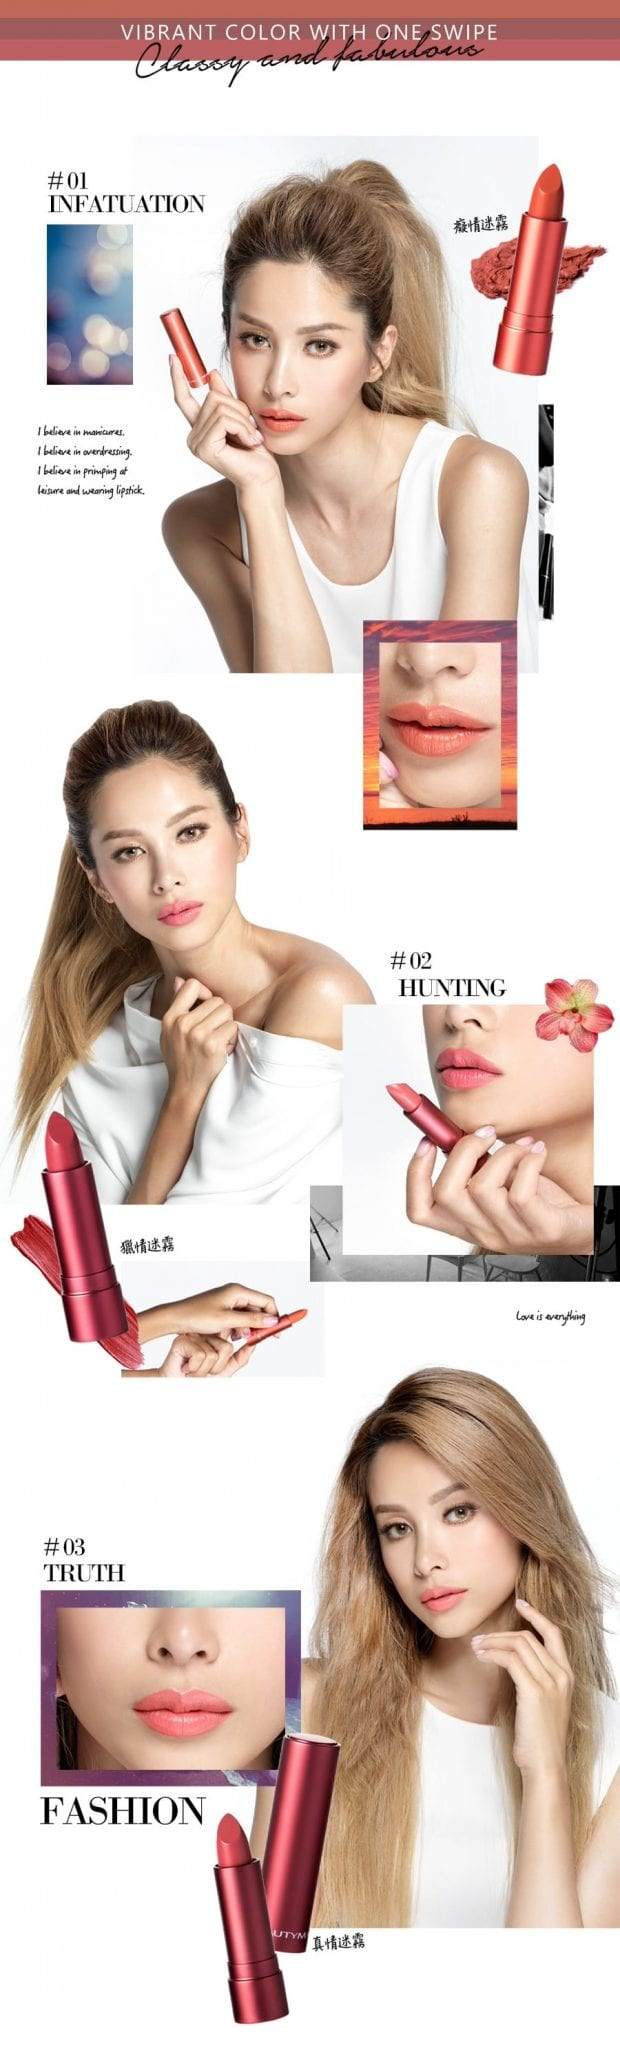 Long-Wear Velvet Lipstick - Product Colors